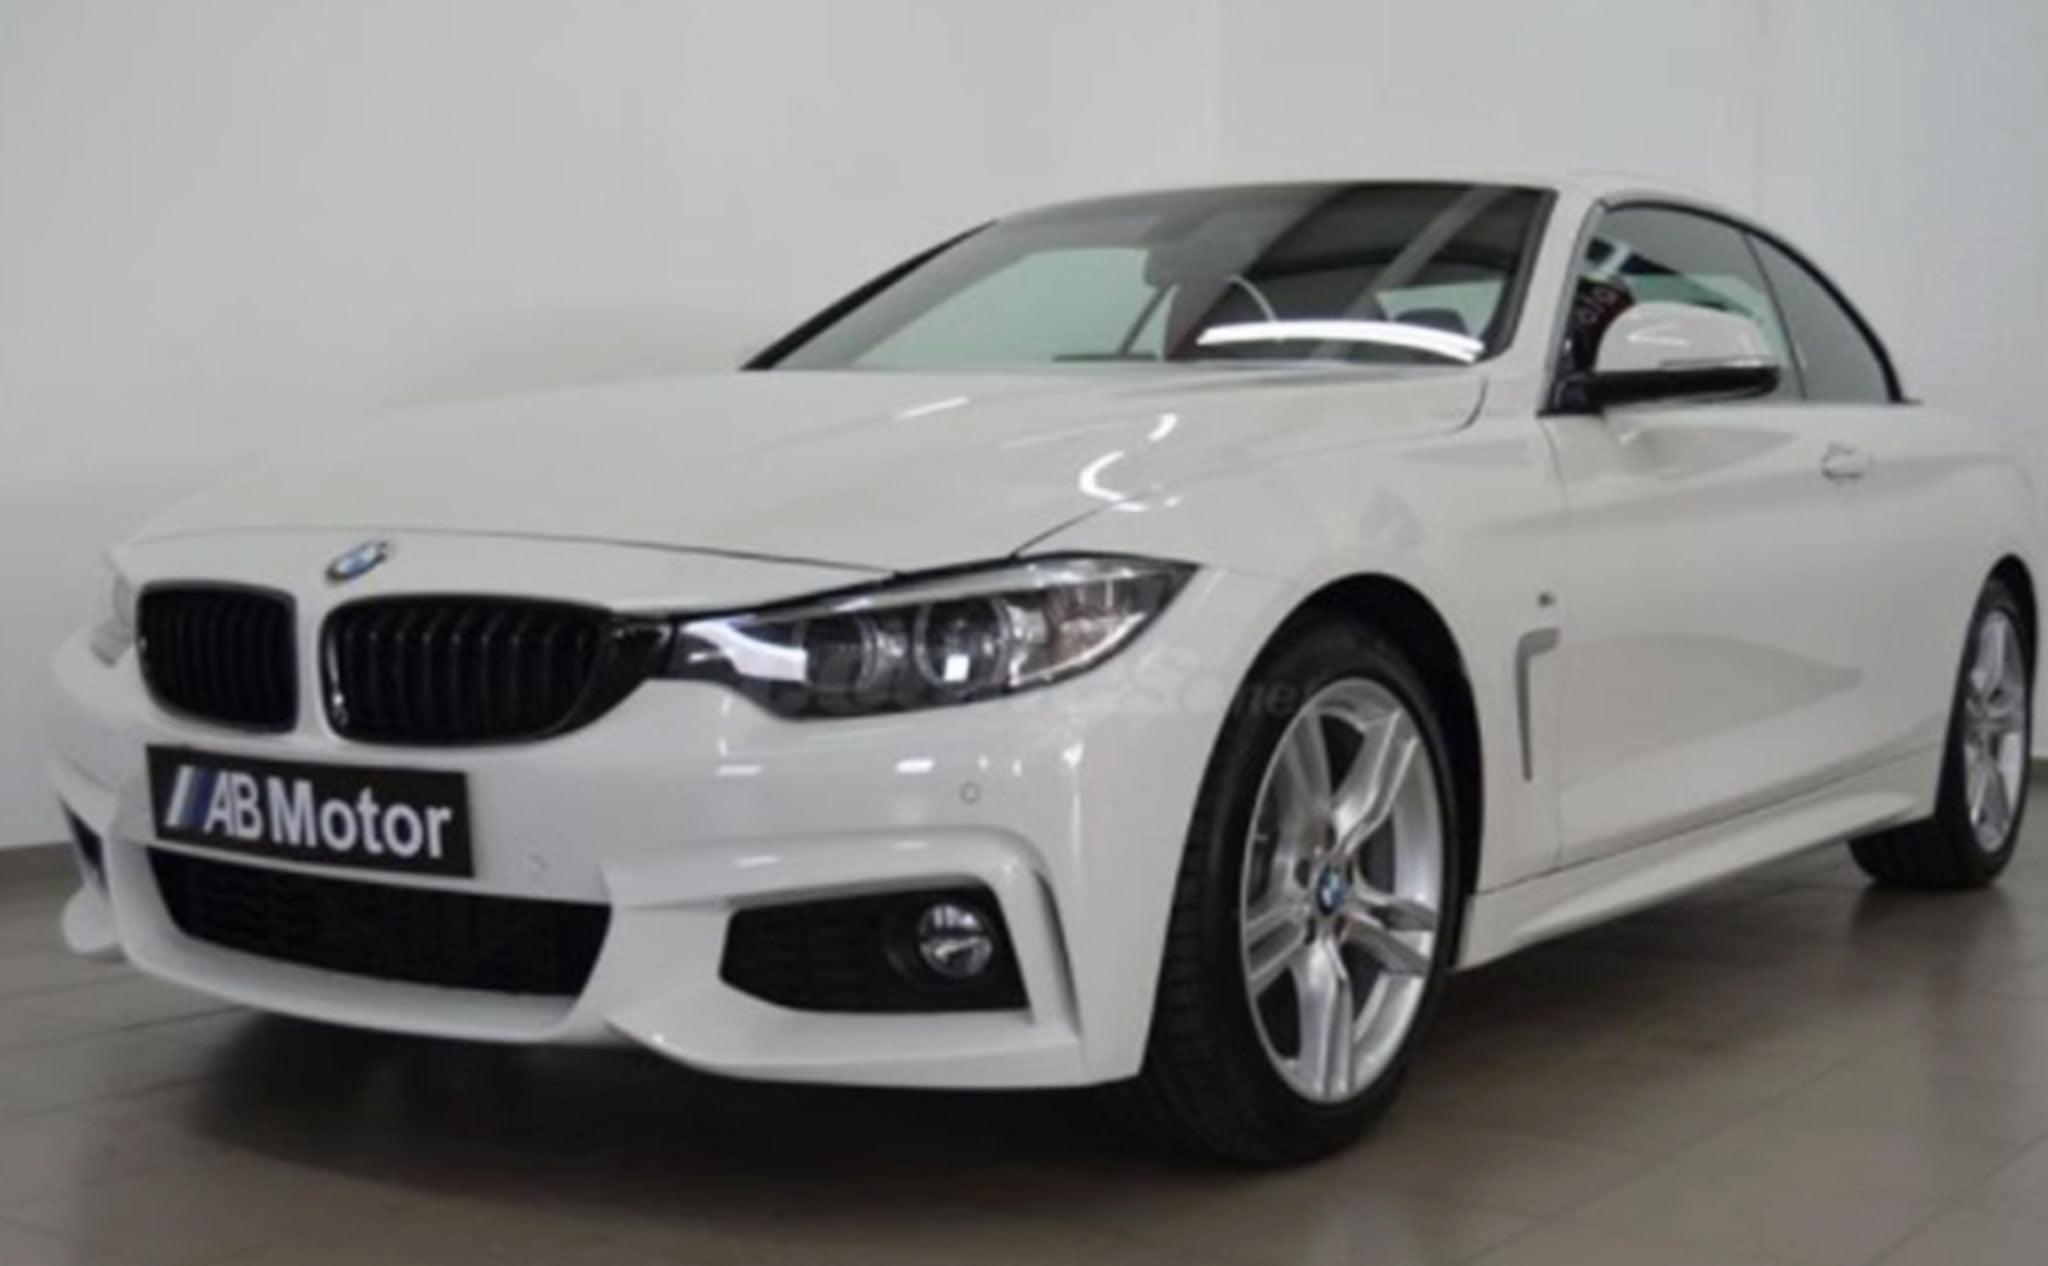 BMW Serie 4 – AB Motor